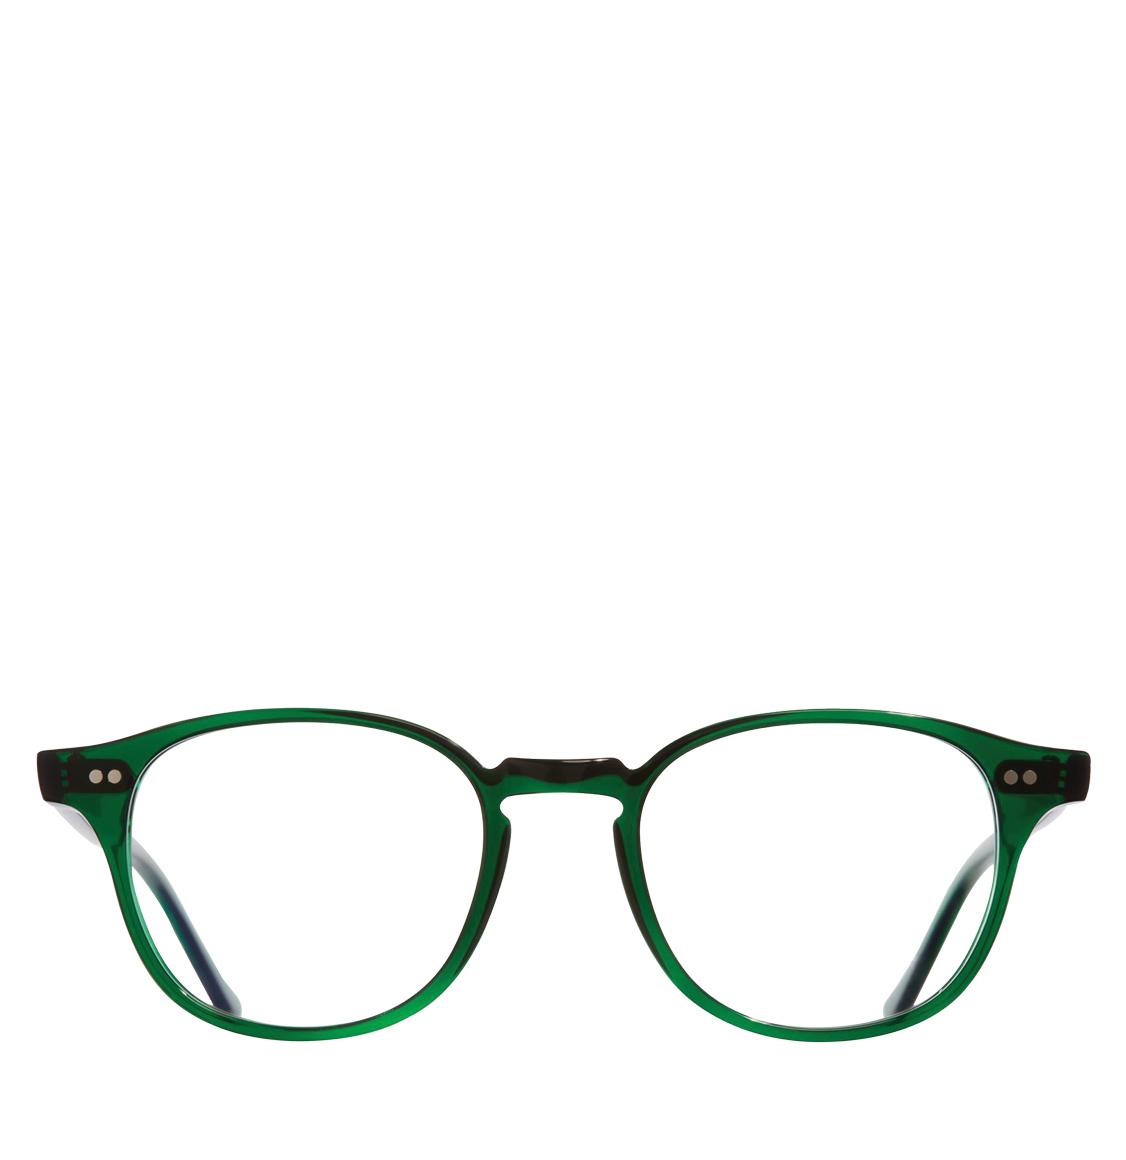 Cutler and Gross D-Frame Bottle Green Acetate Optical Glasses